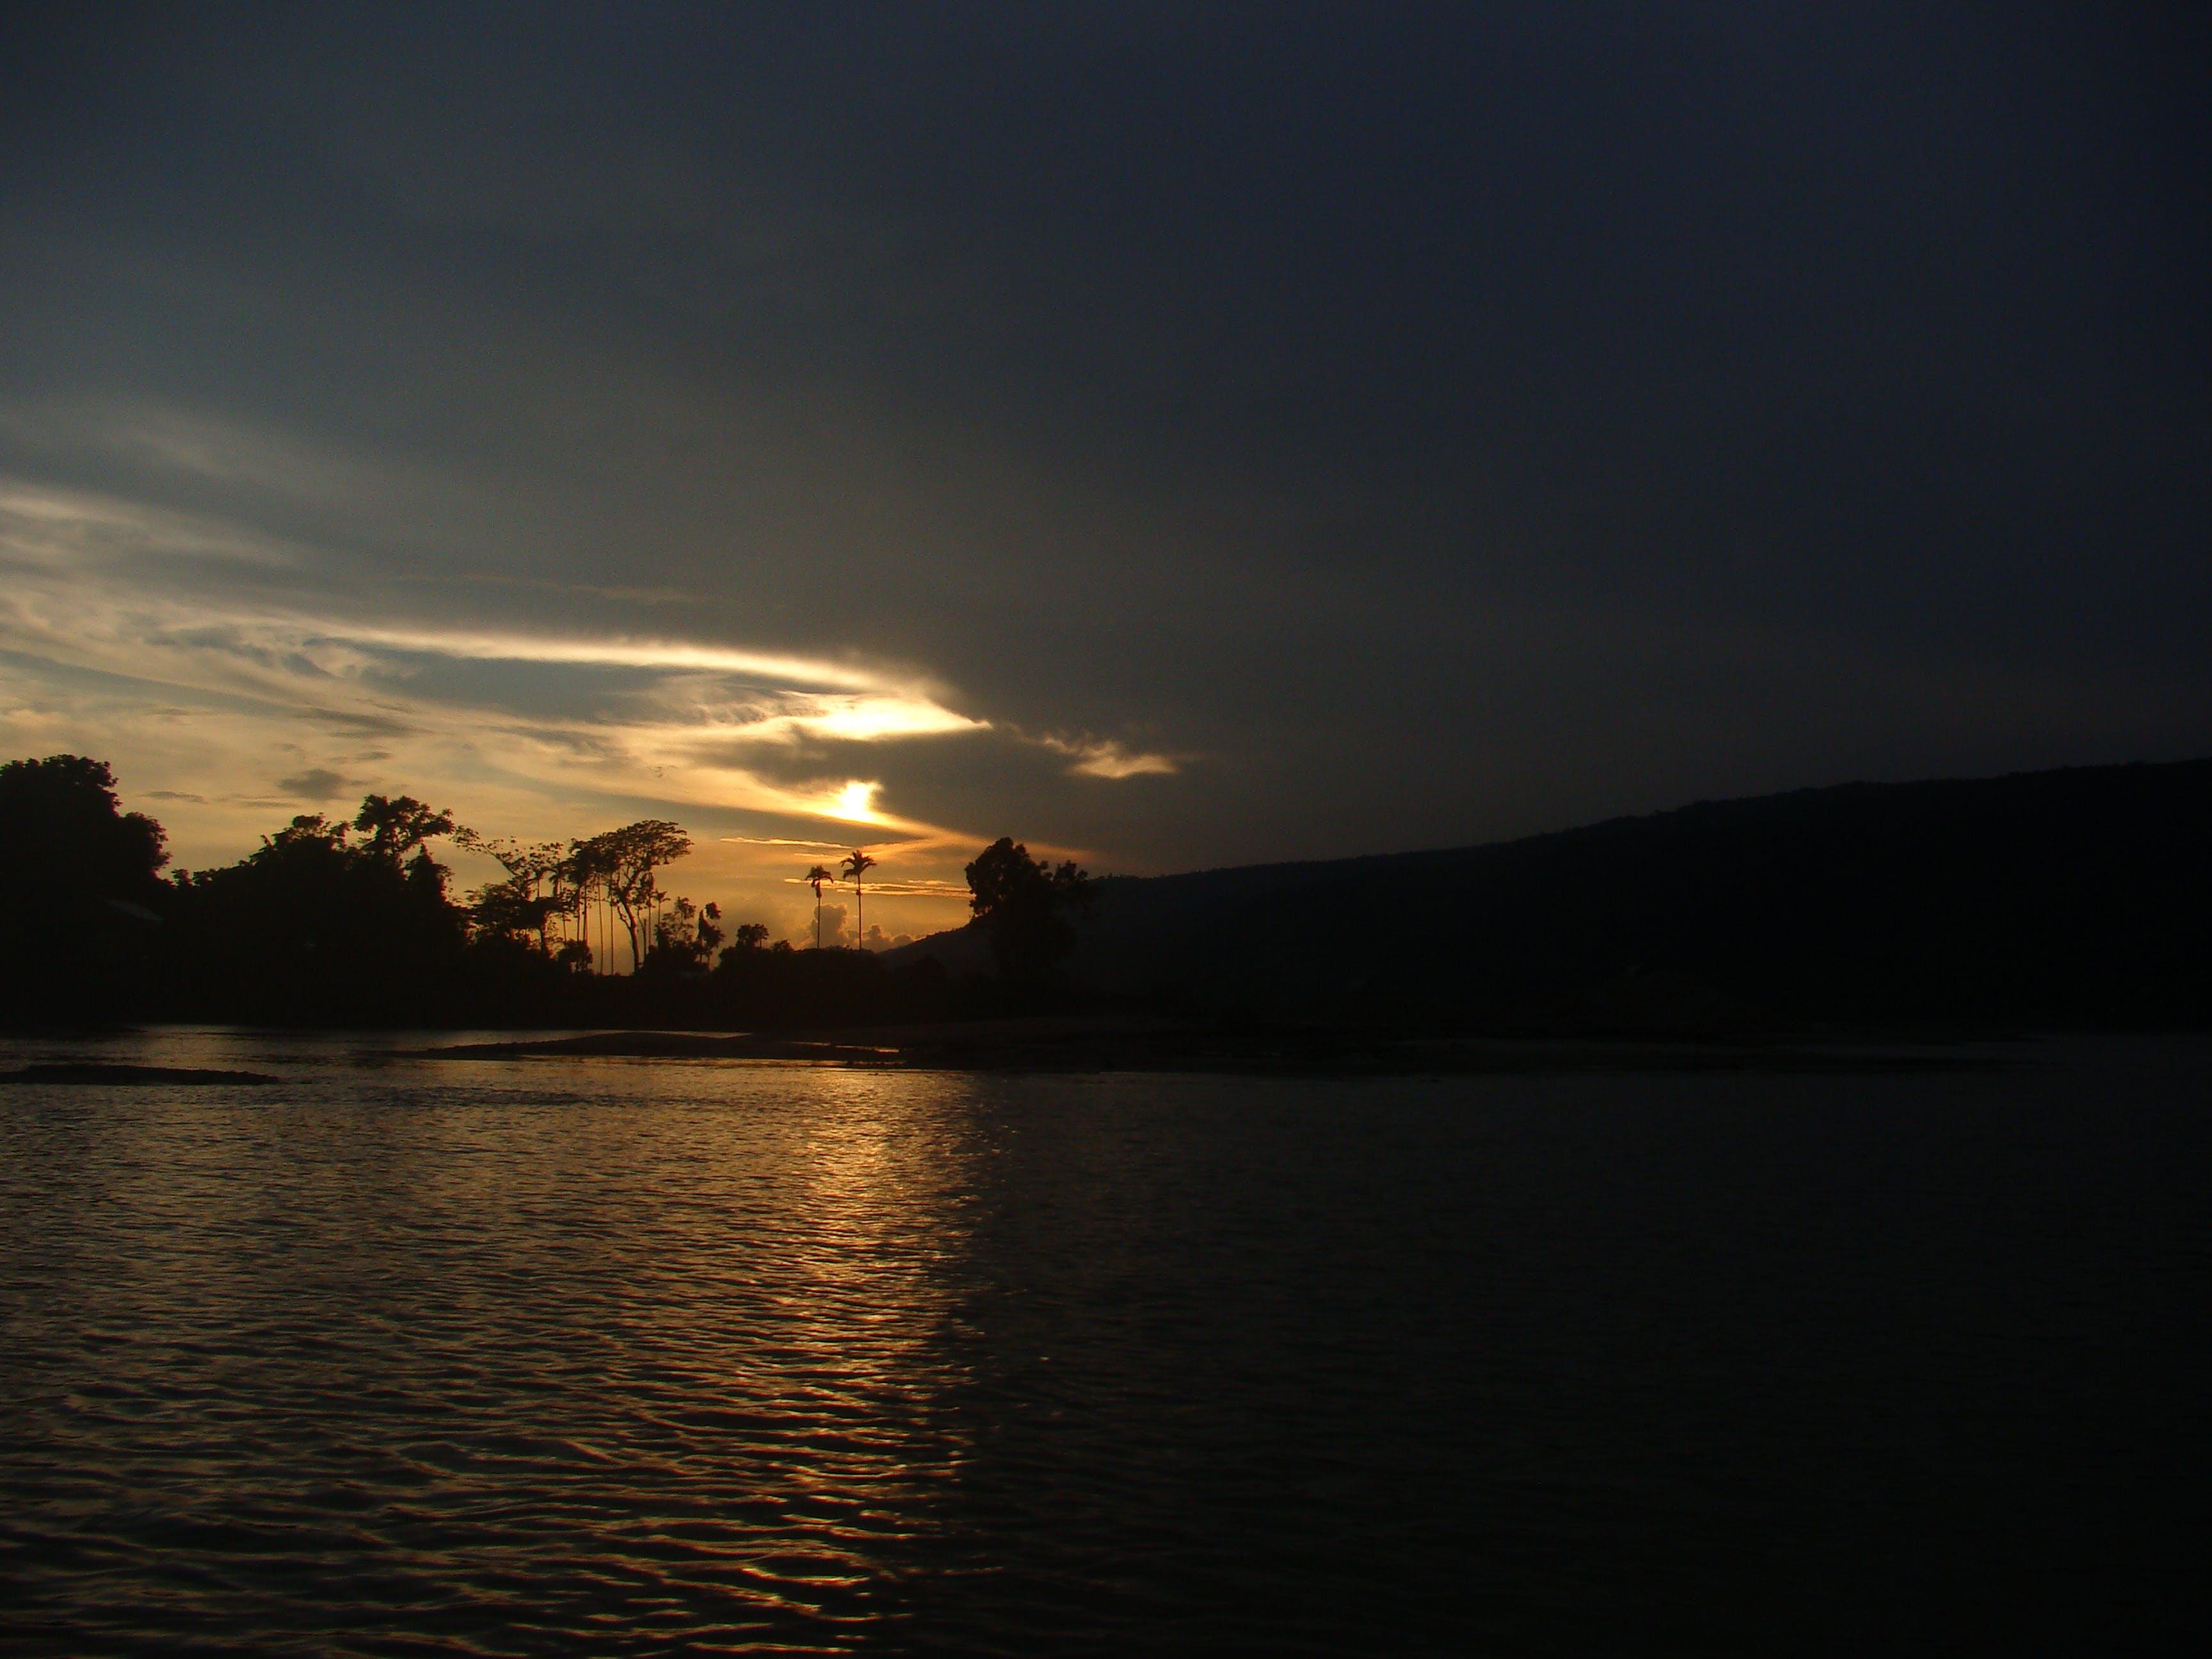 Free stock photo of sunset